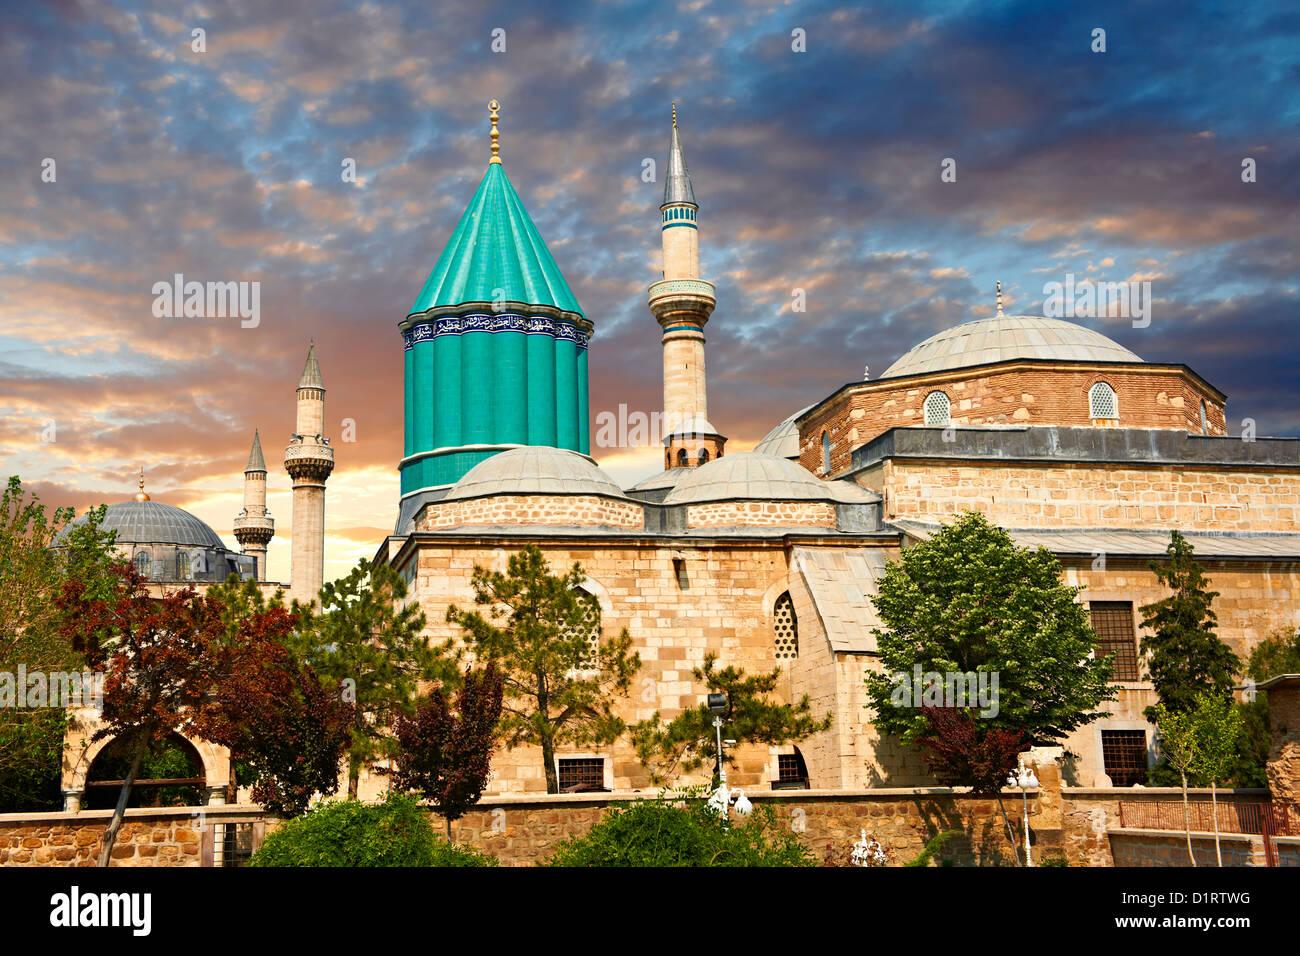 El museo de Mevlâna, con el mausoleo de cúpula azul de Jalal ad-Din Muhammad Rumi, Konya, Turquía Foto de stock